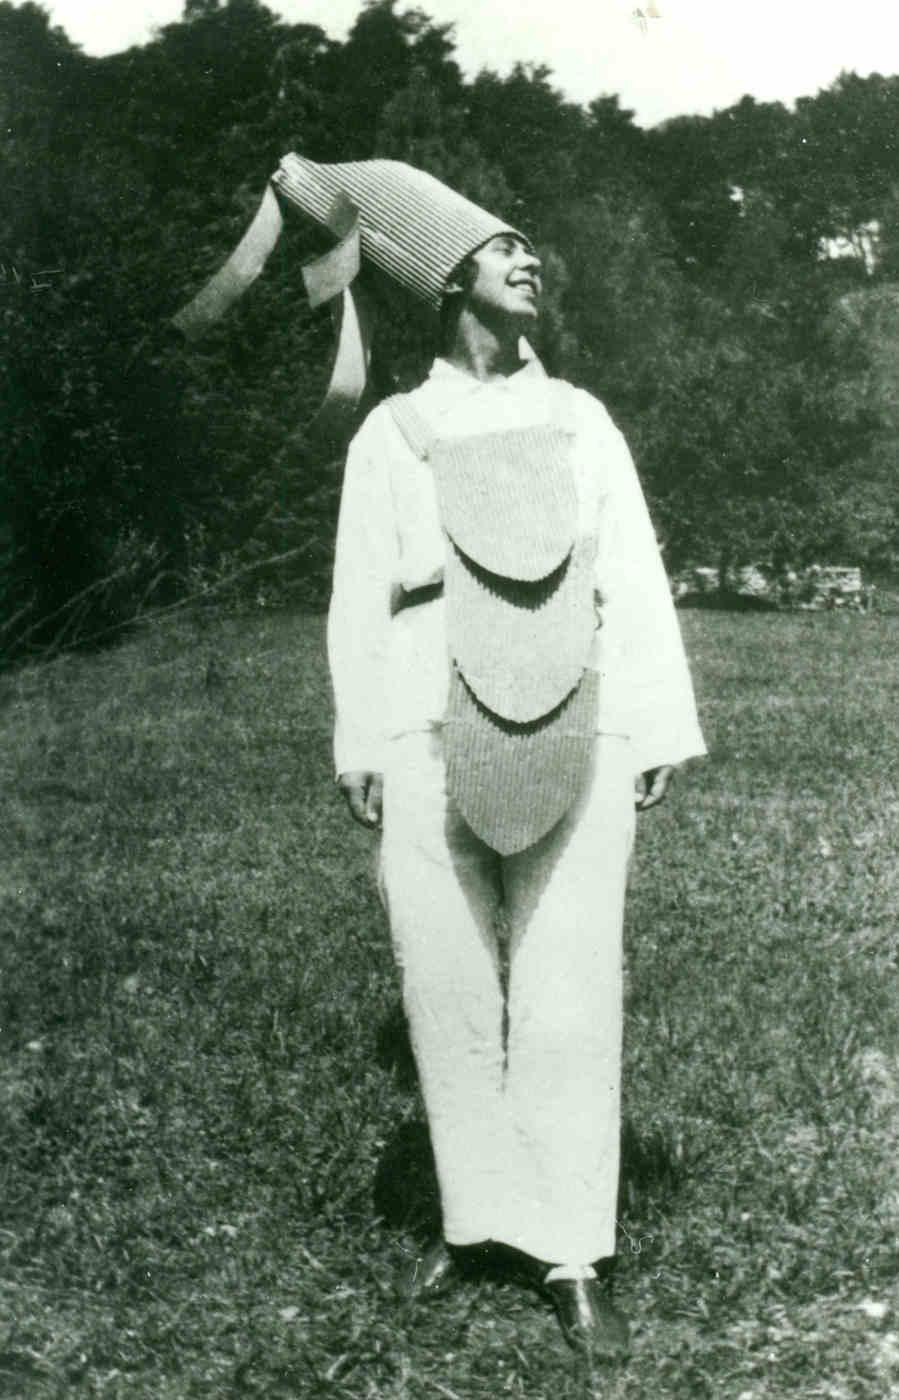 Sophie Taeuber-Arp in Ascona, 1925